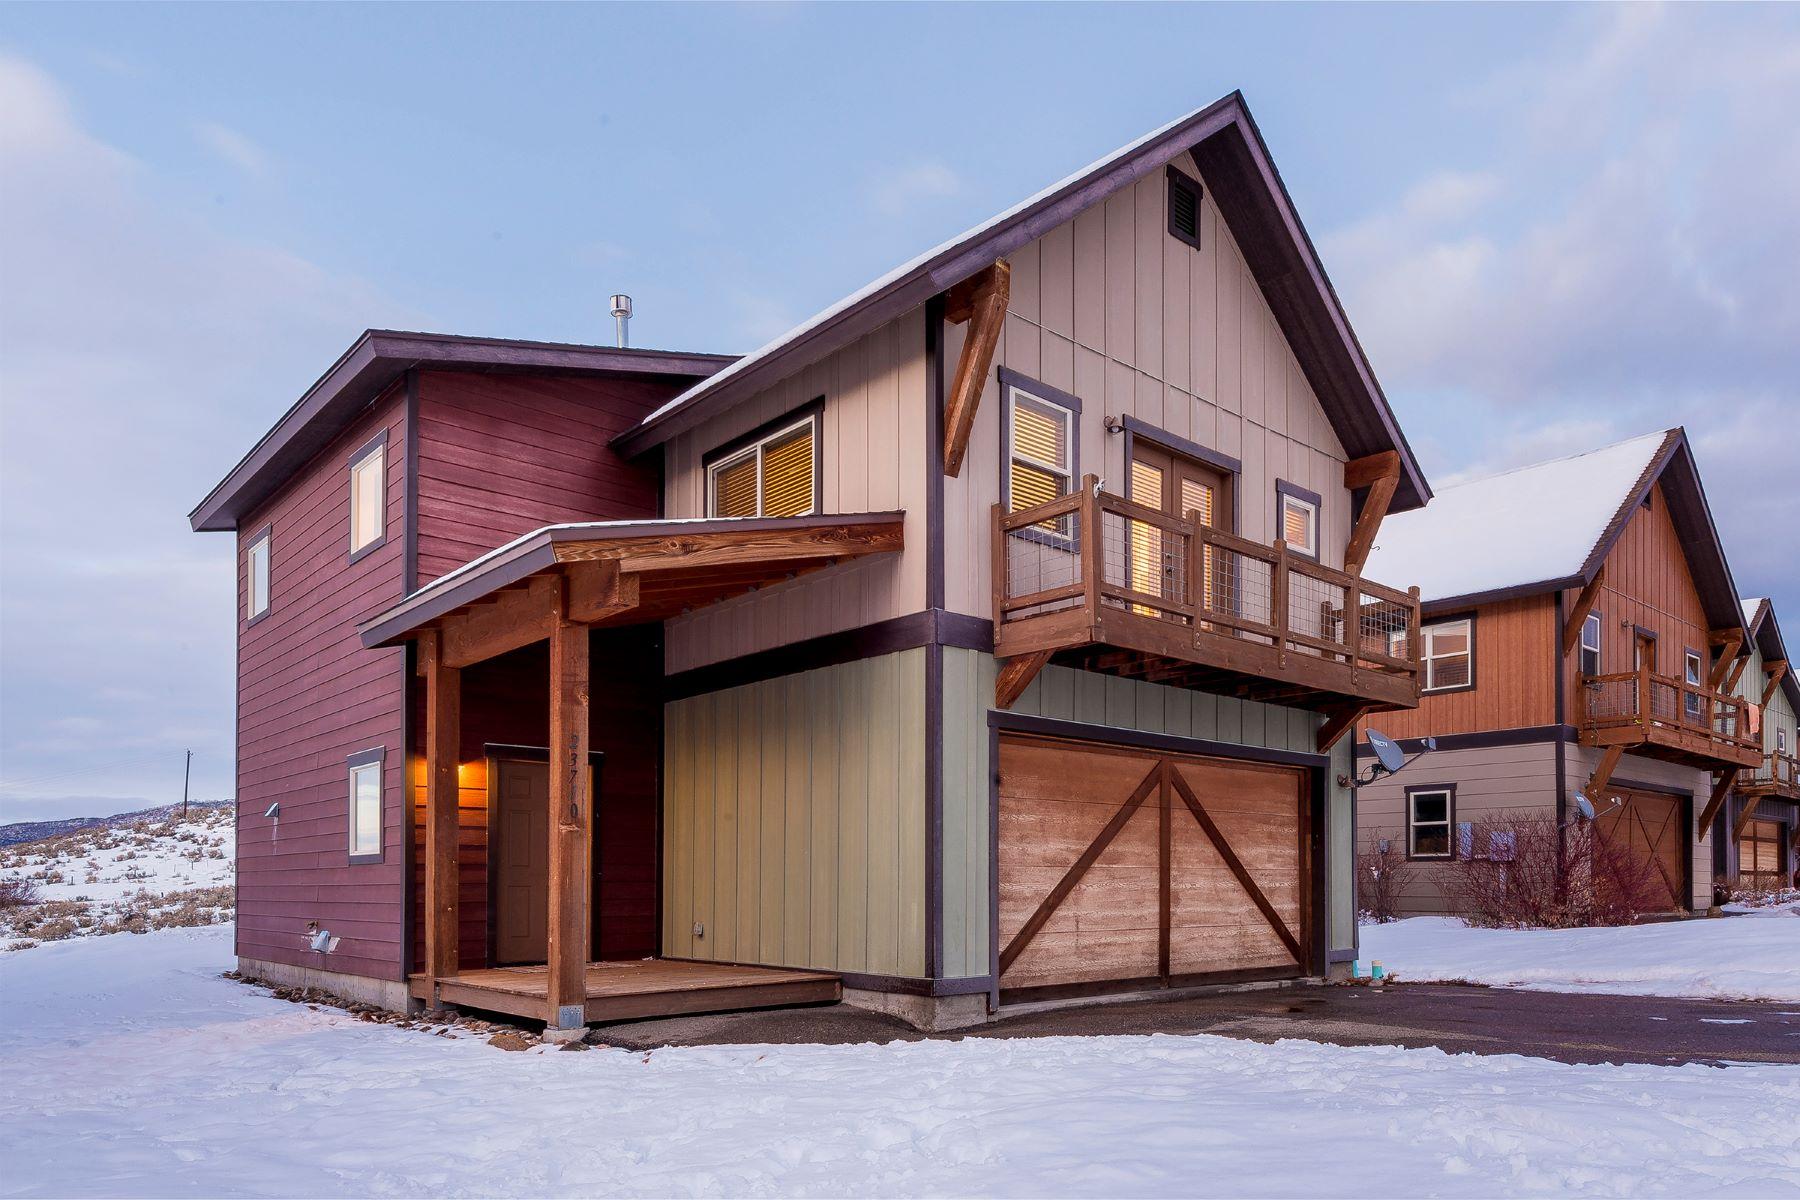 Single Family Home for Sale at Red Hawk Village, Stagecoach Colorado 23710 Sagebrush Cir, Oak Creek, Colorado, 80467 United States